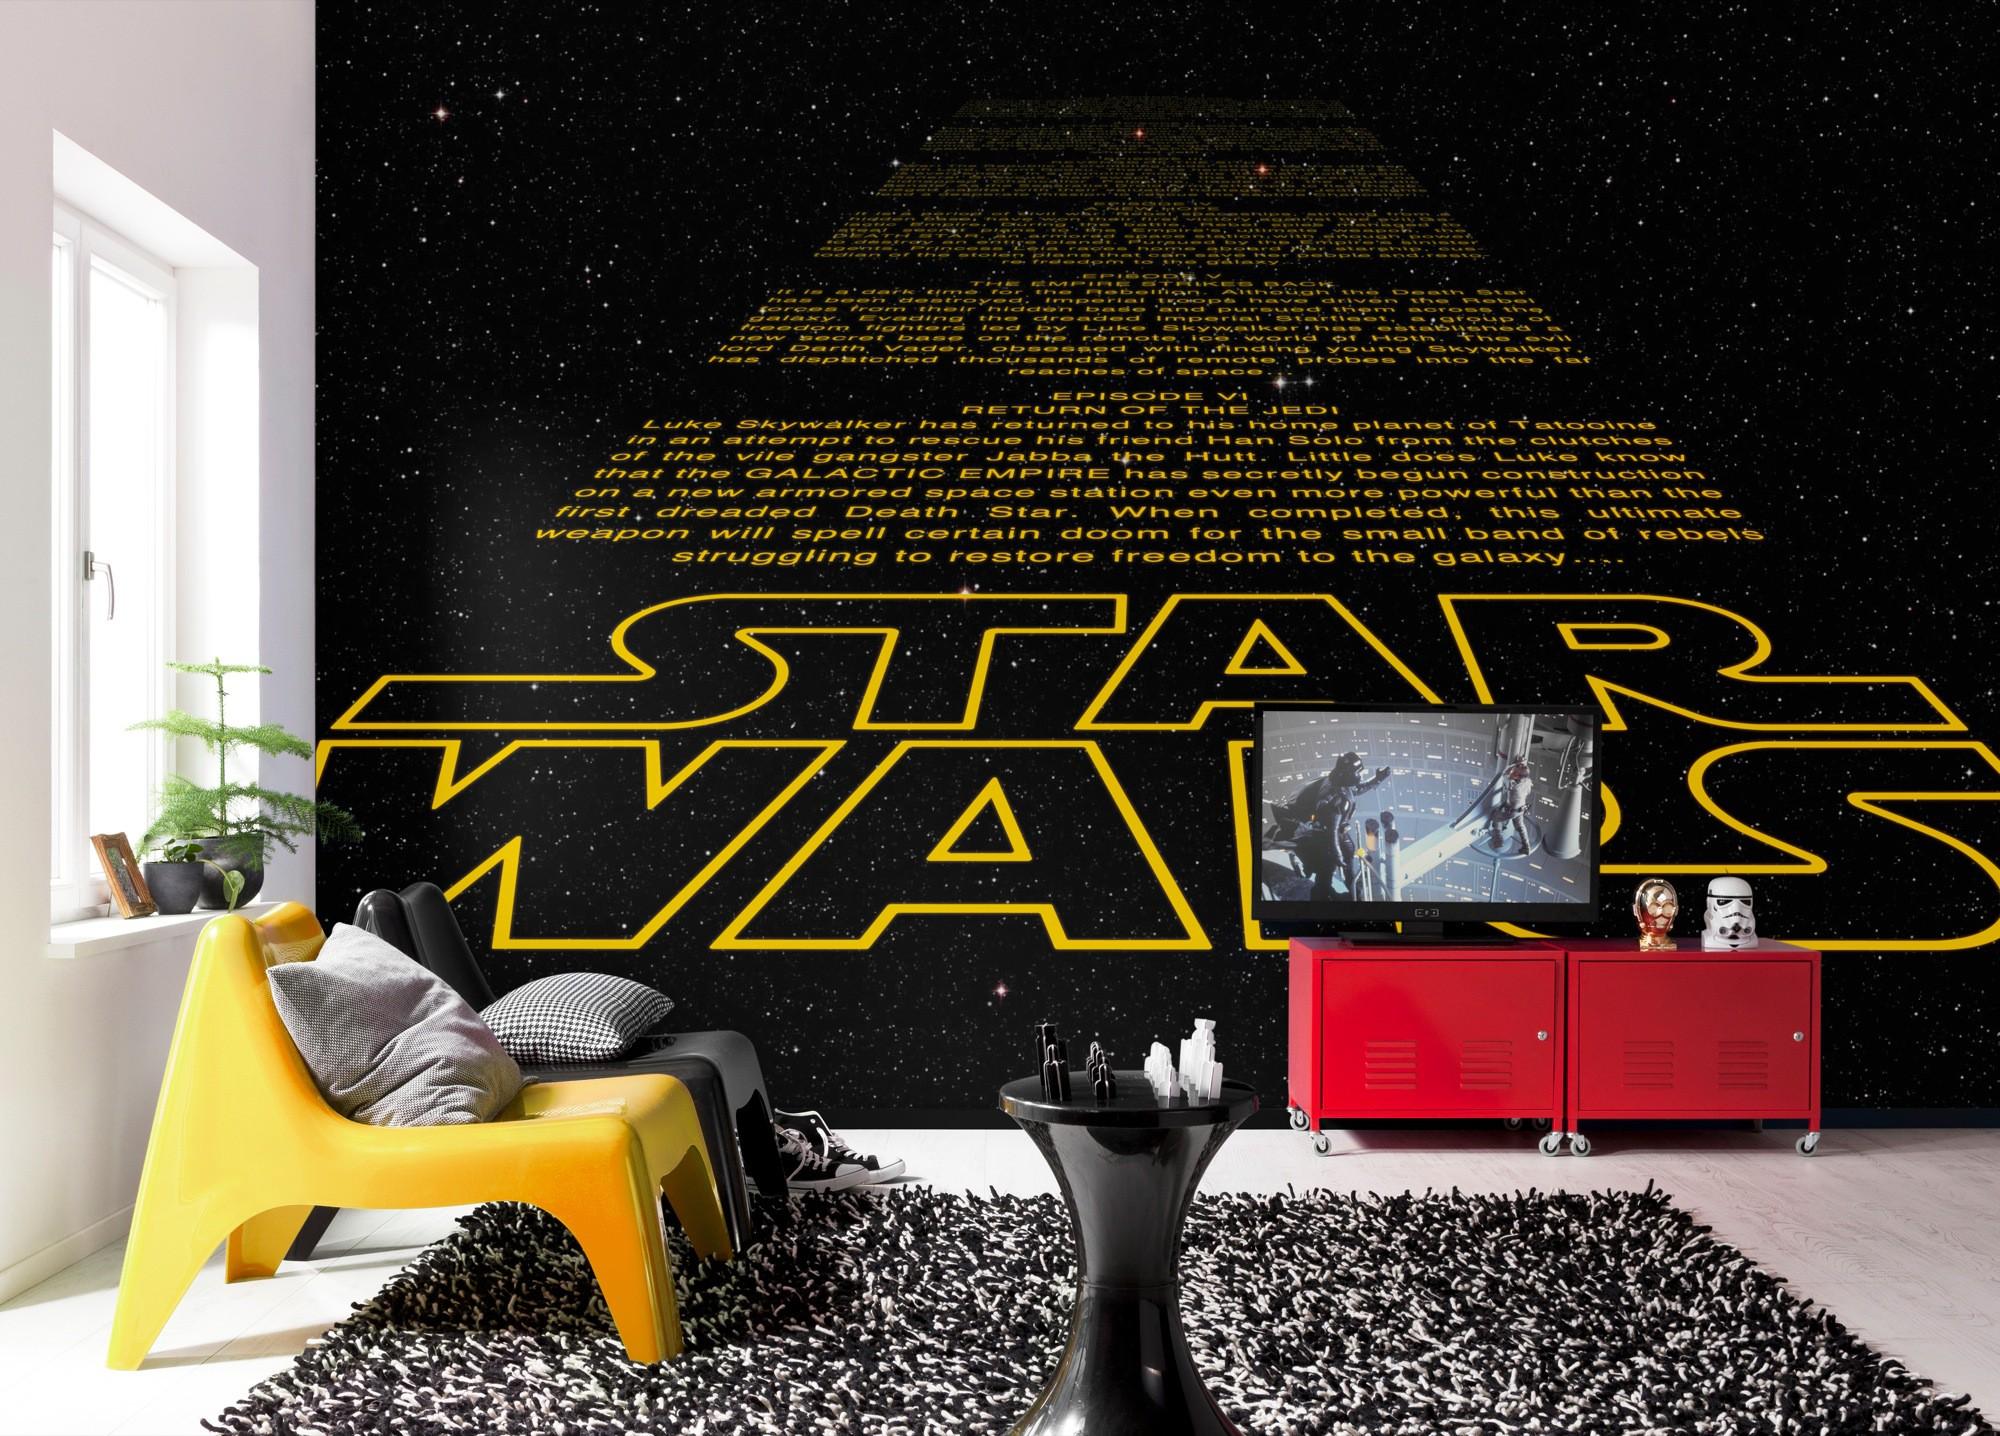 Star Wars intro fali poszter